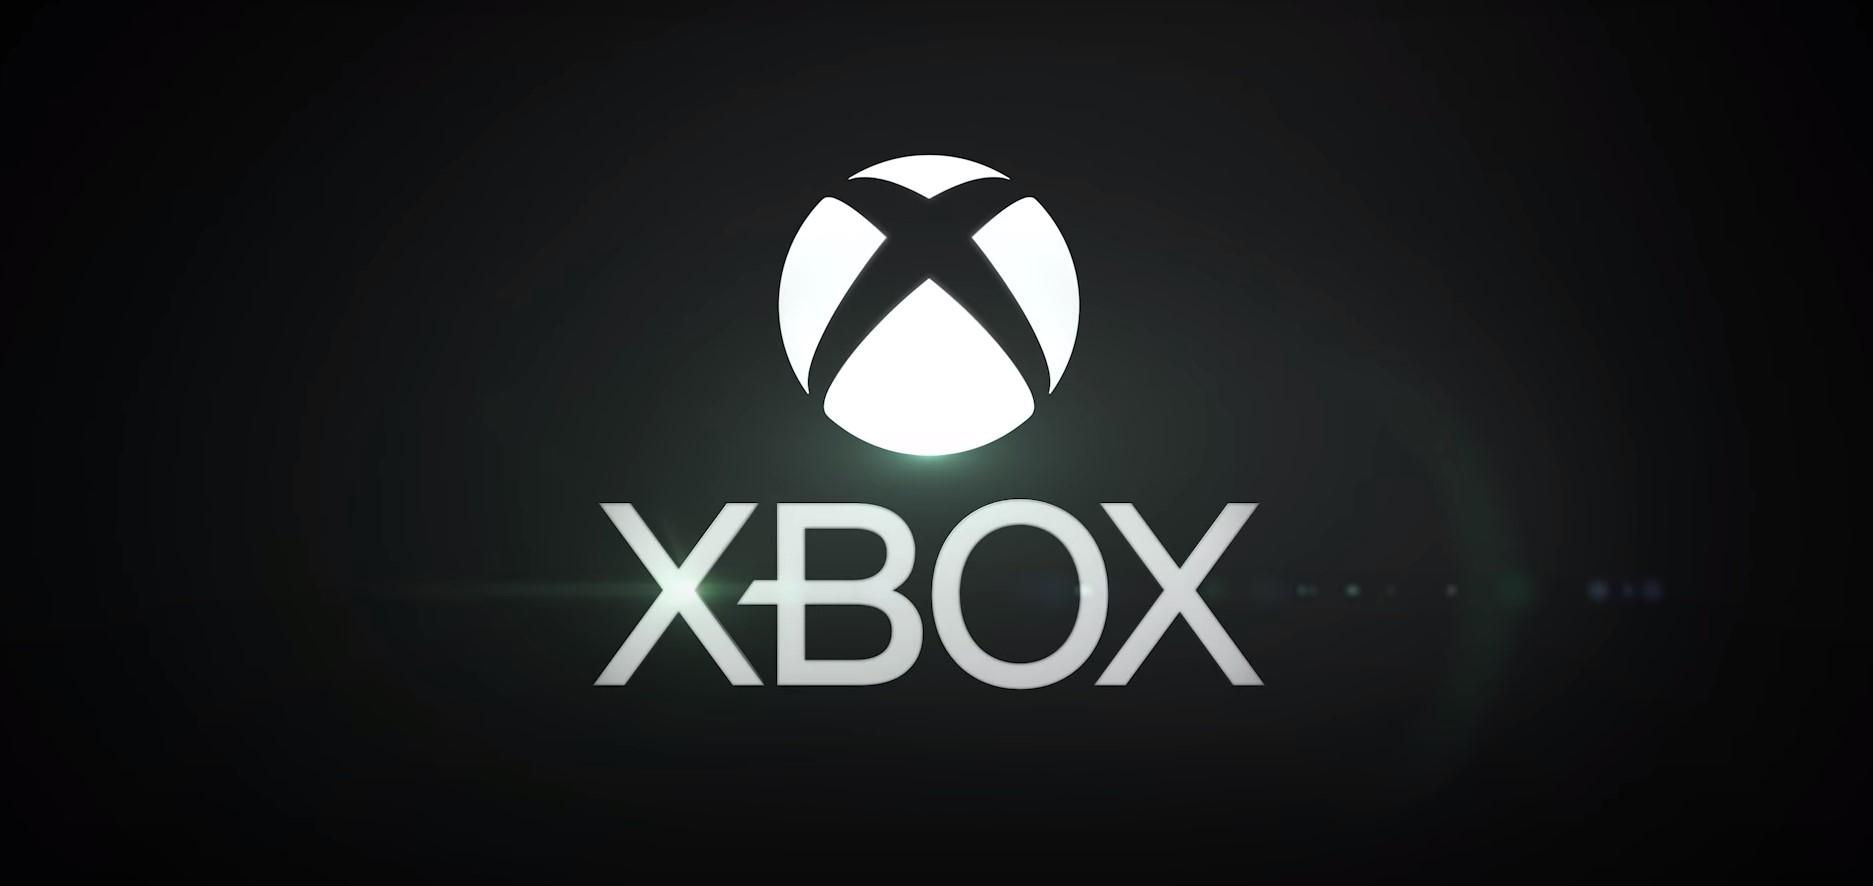 Xbox Series X boot screen